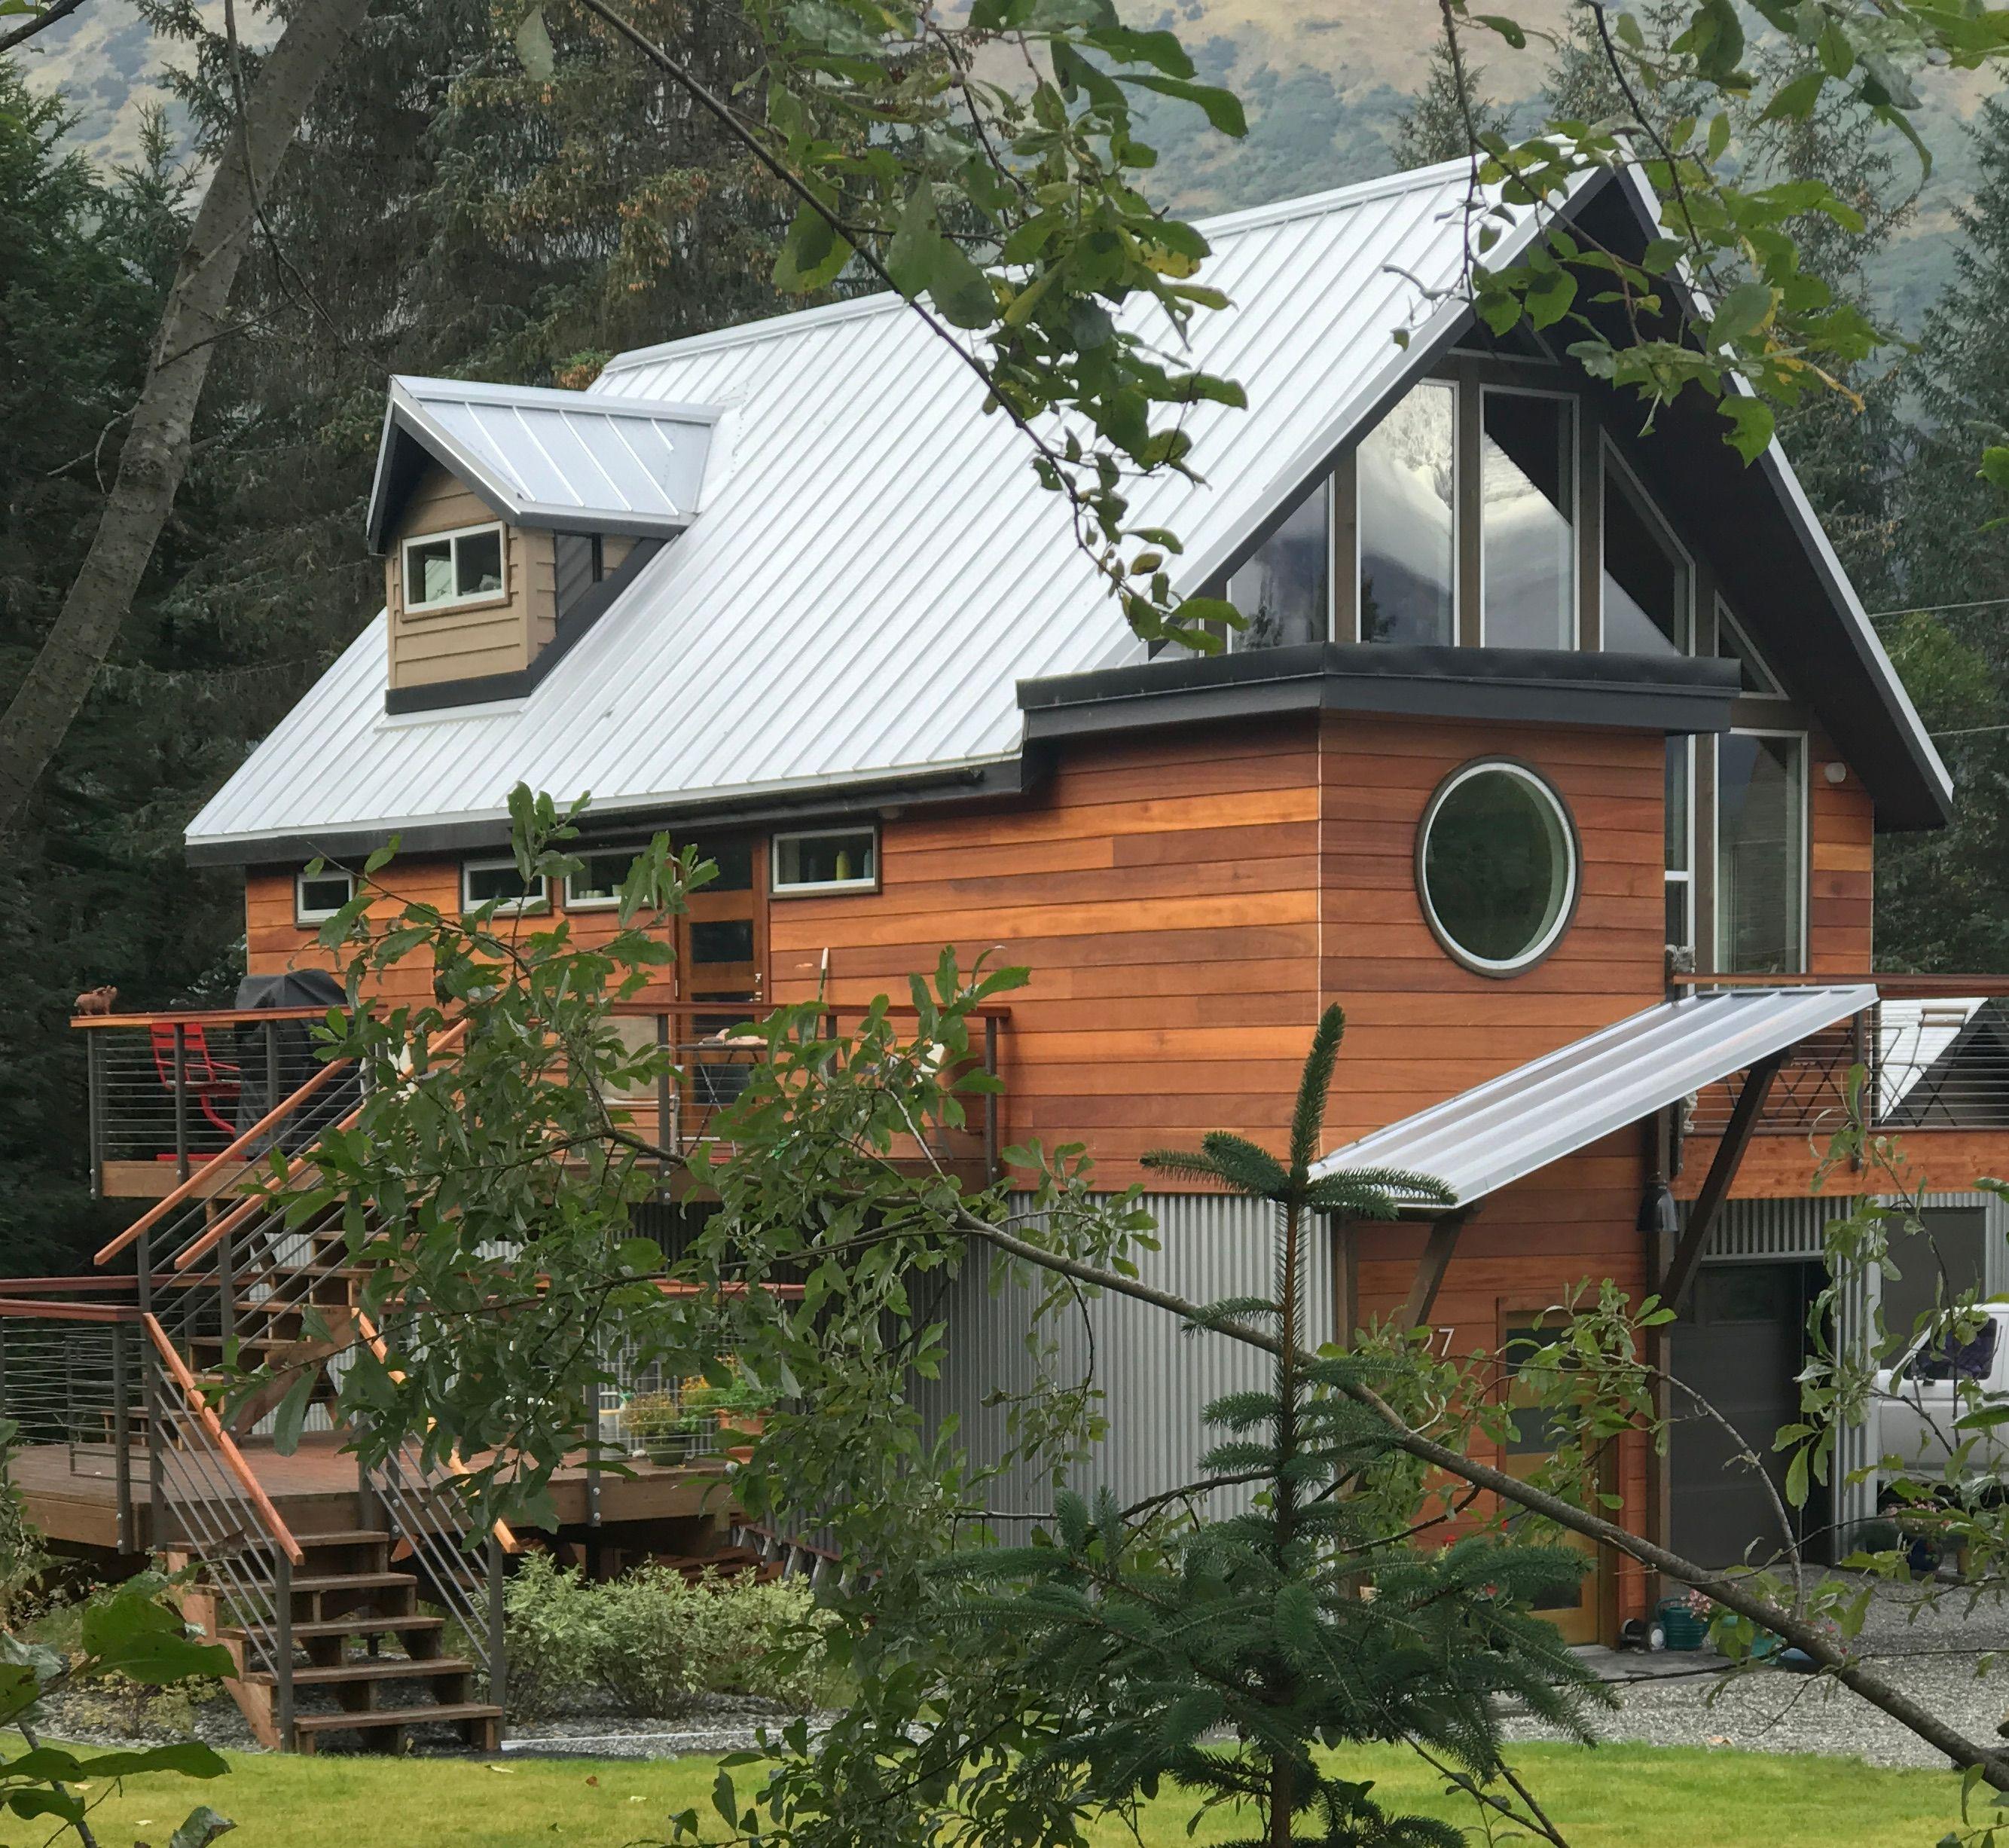 Awesome Alaskan Cabin Featuring Nova Batu 6 Inch Wood Siding Hardwood Siding Application Wood Siding Exterior Wood Siding Installing Wood Siding